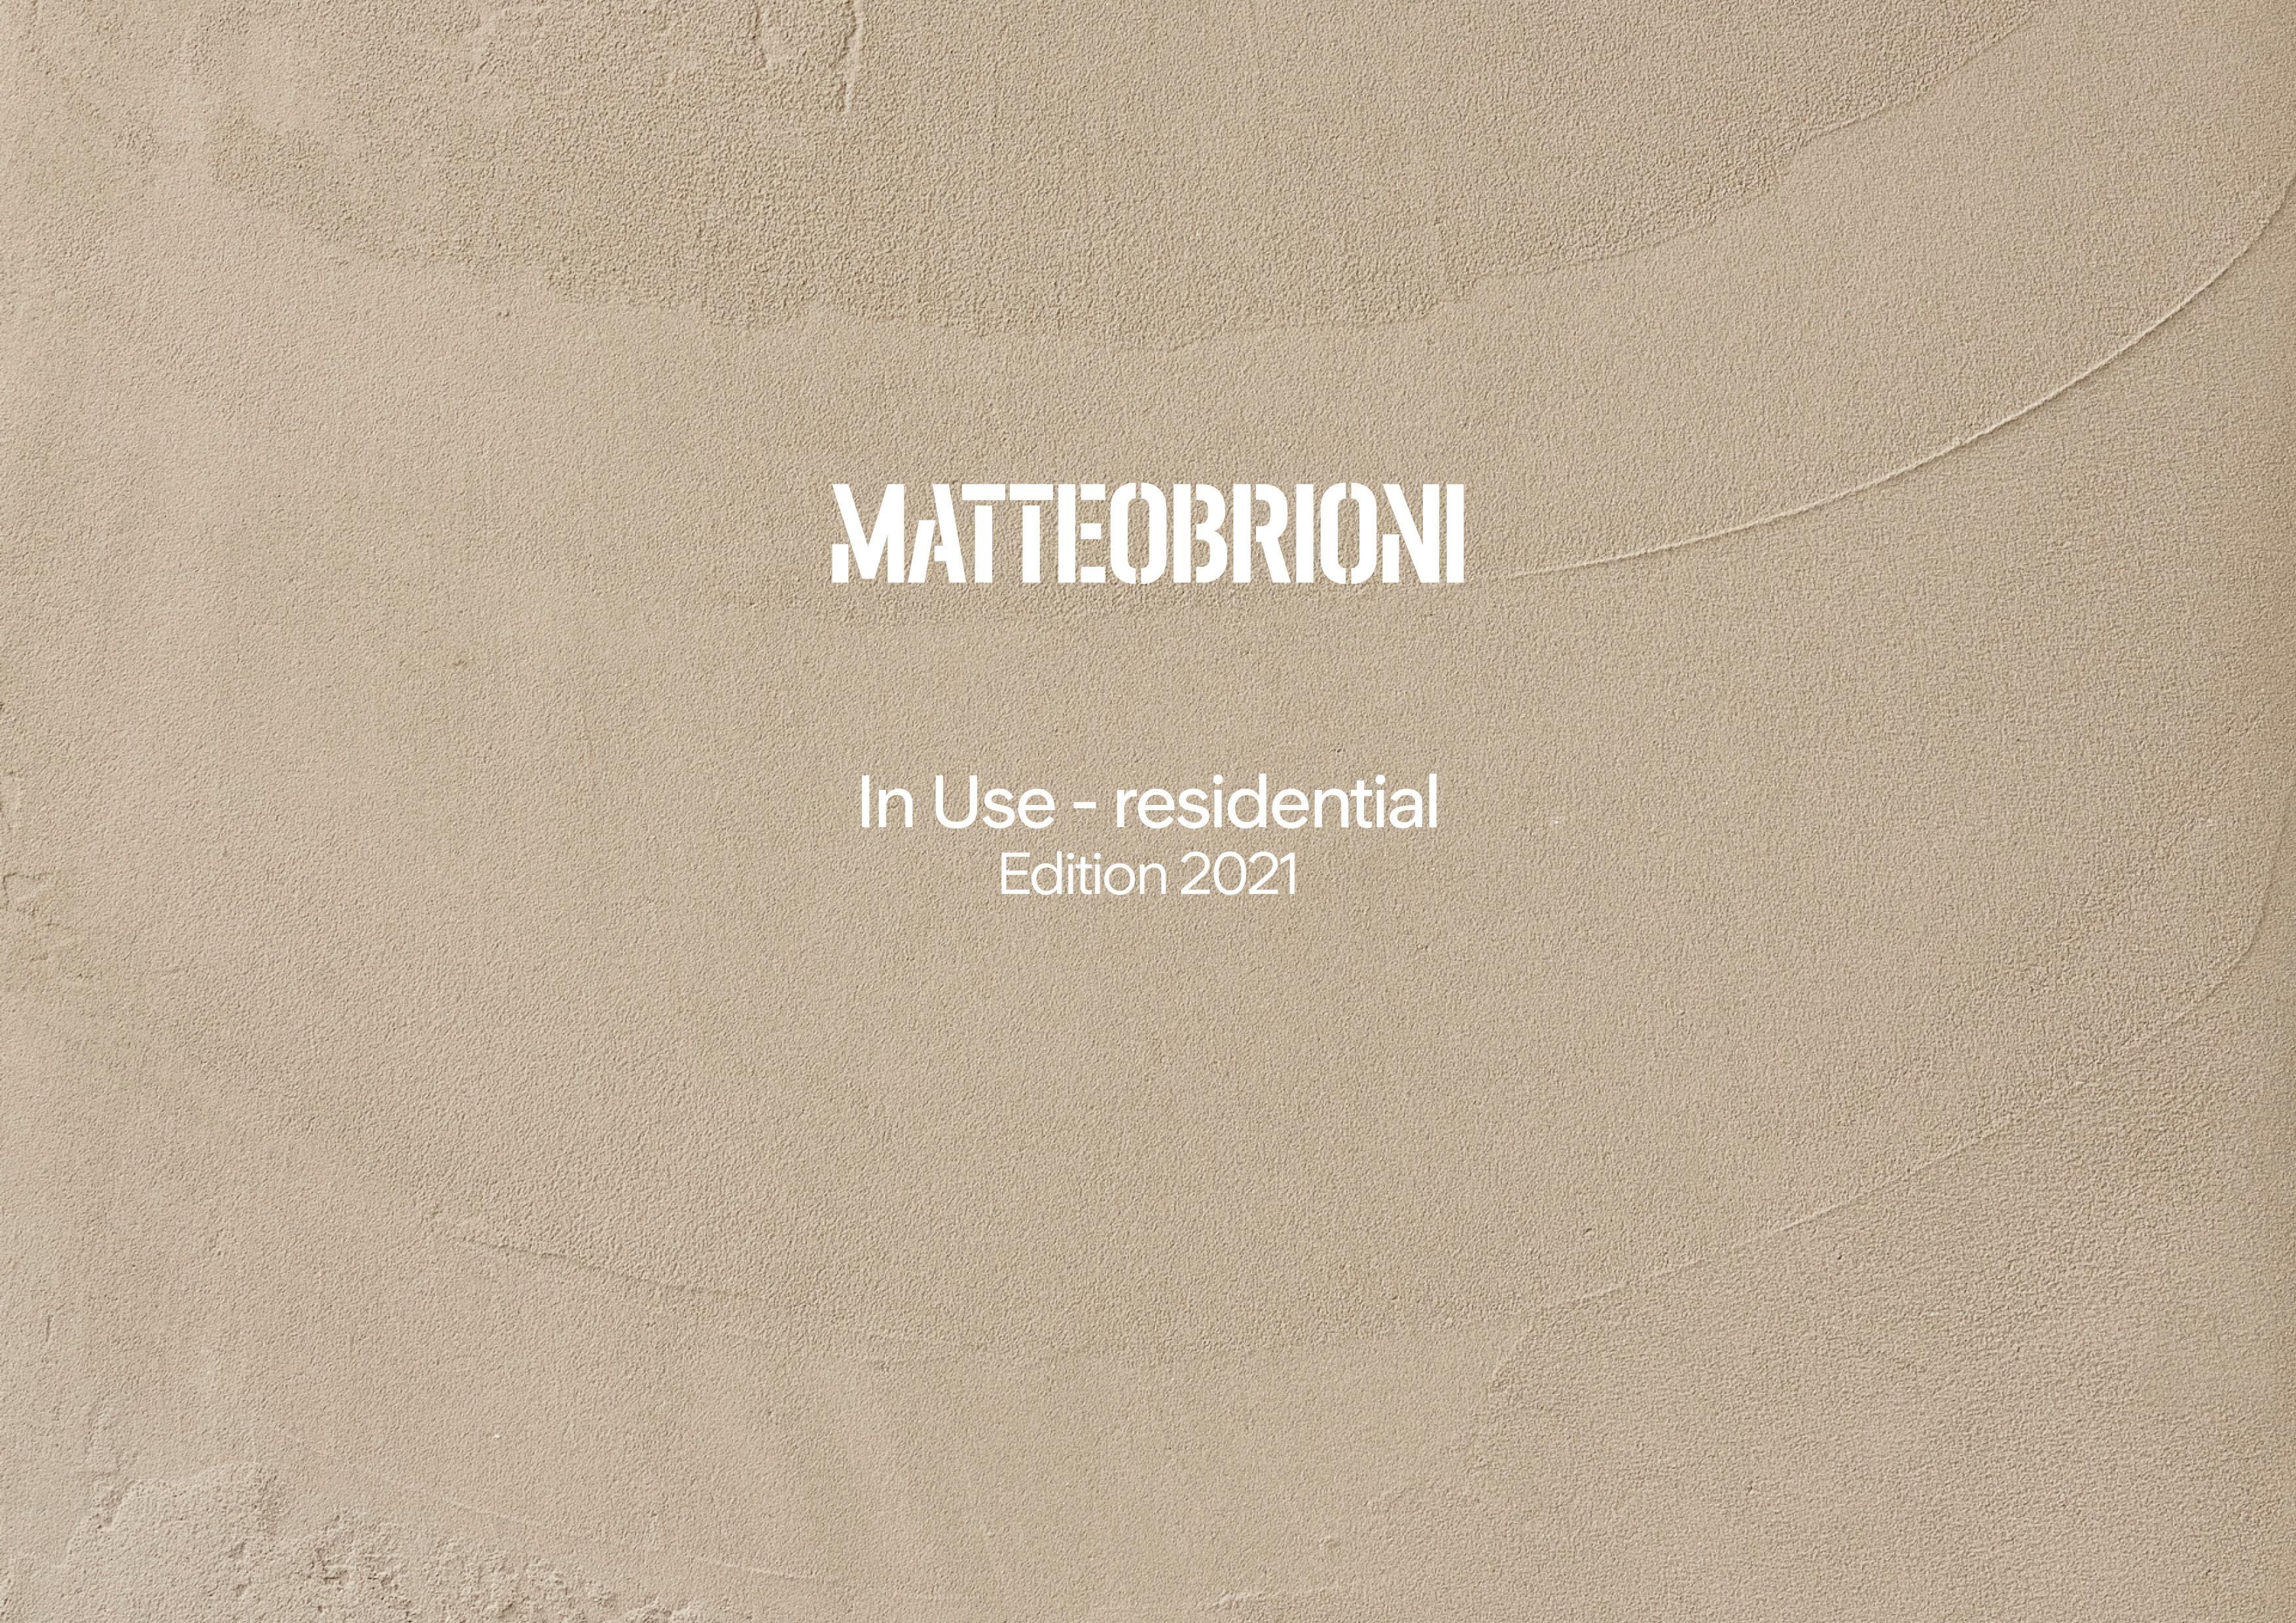 Matteo Brioni In Use 2021 Residential presentation English, by Lorenzo Carmassi